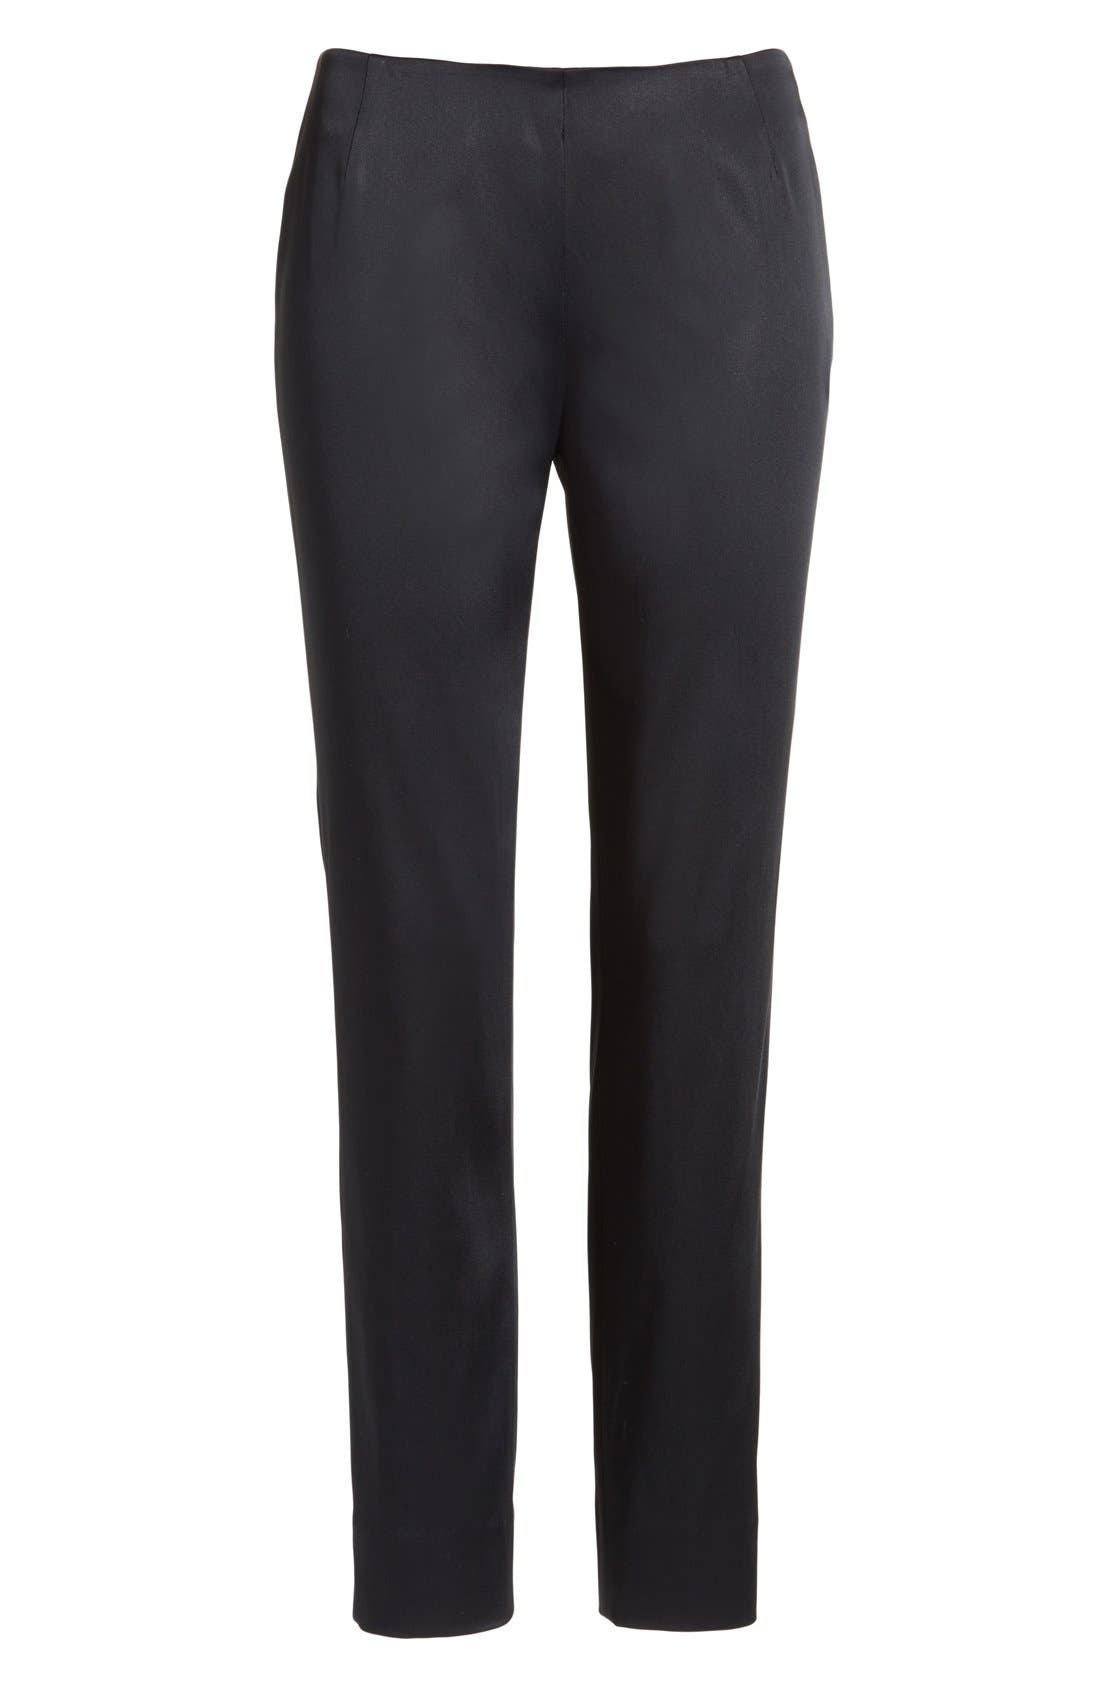 'Stanton - Belle Satin' Pants,                             Alternate thumbnail 7, color,                             BLACK